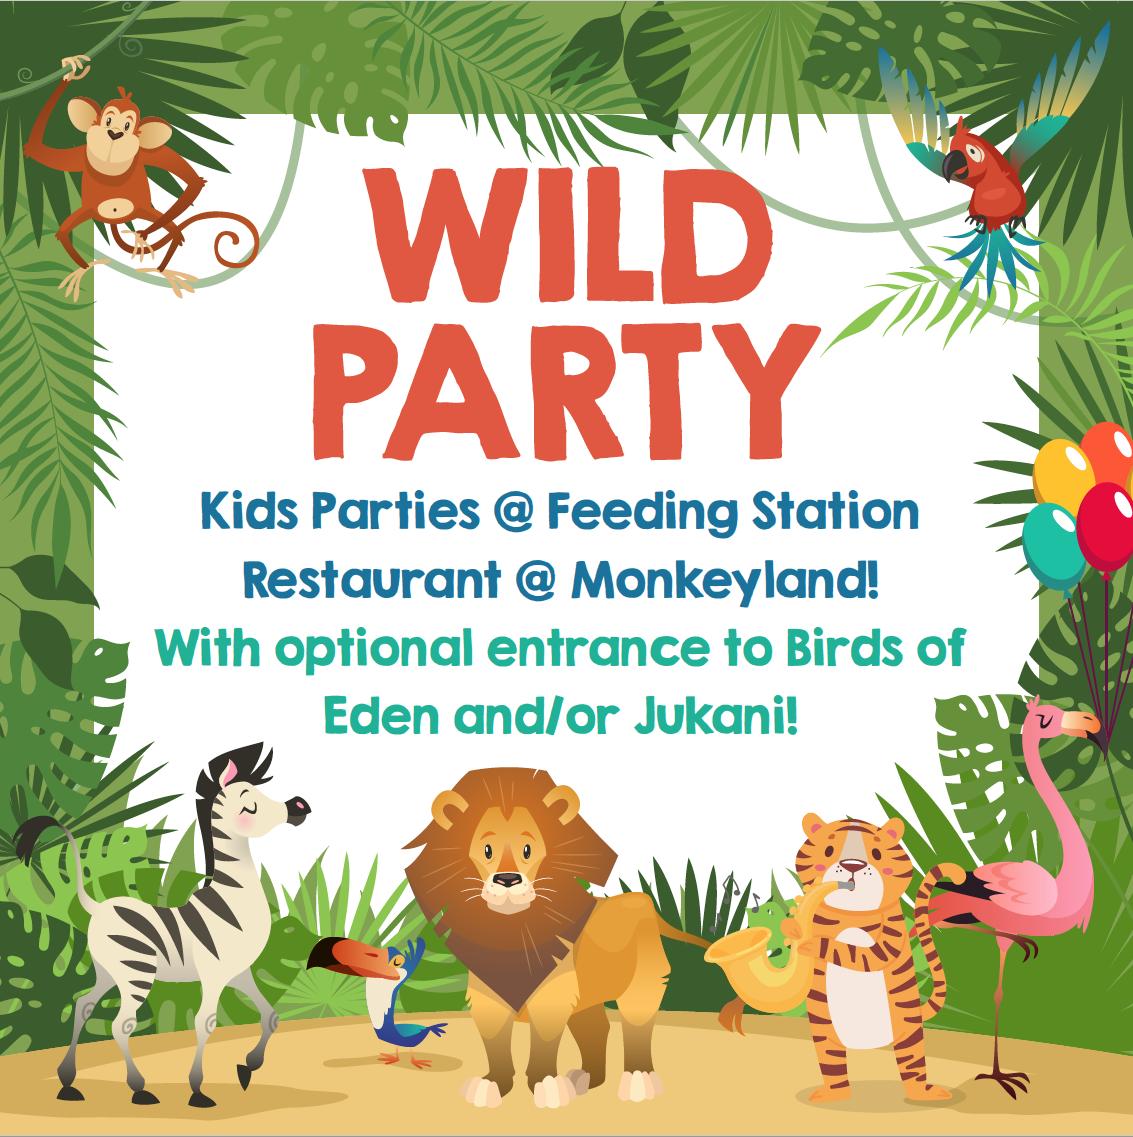 Monkeyland-Feeding-Station-Kiddies-Parties